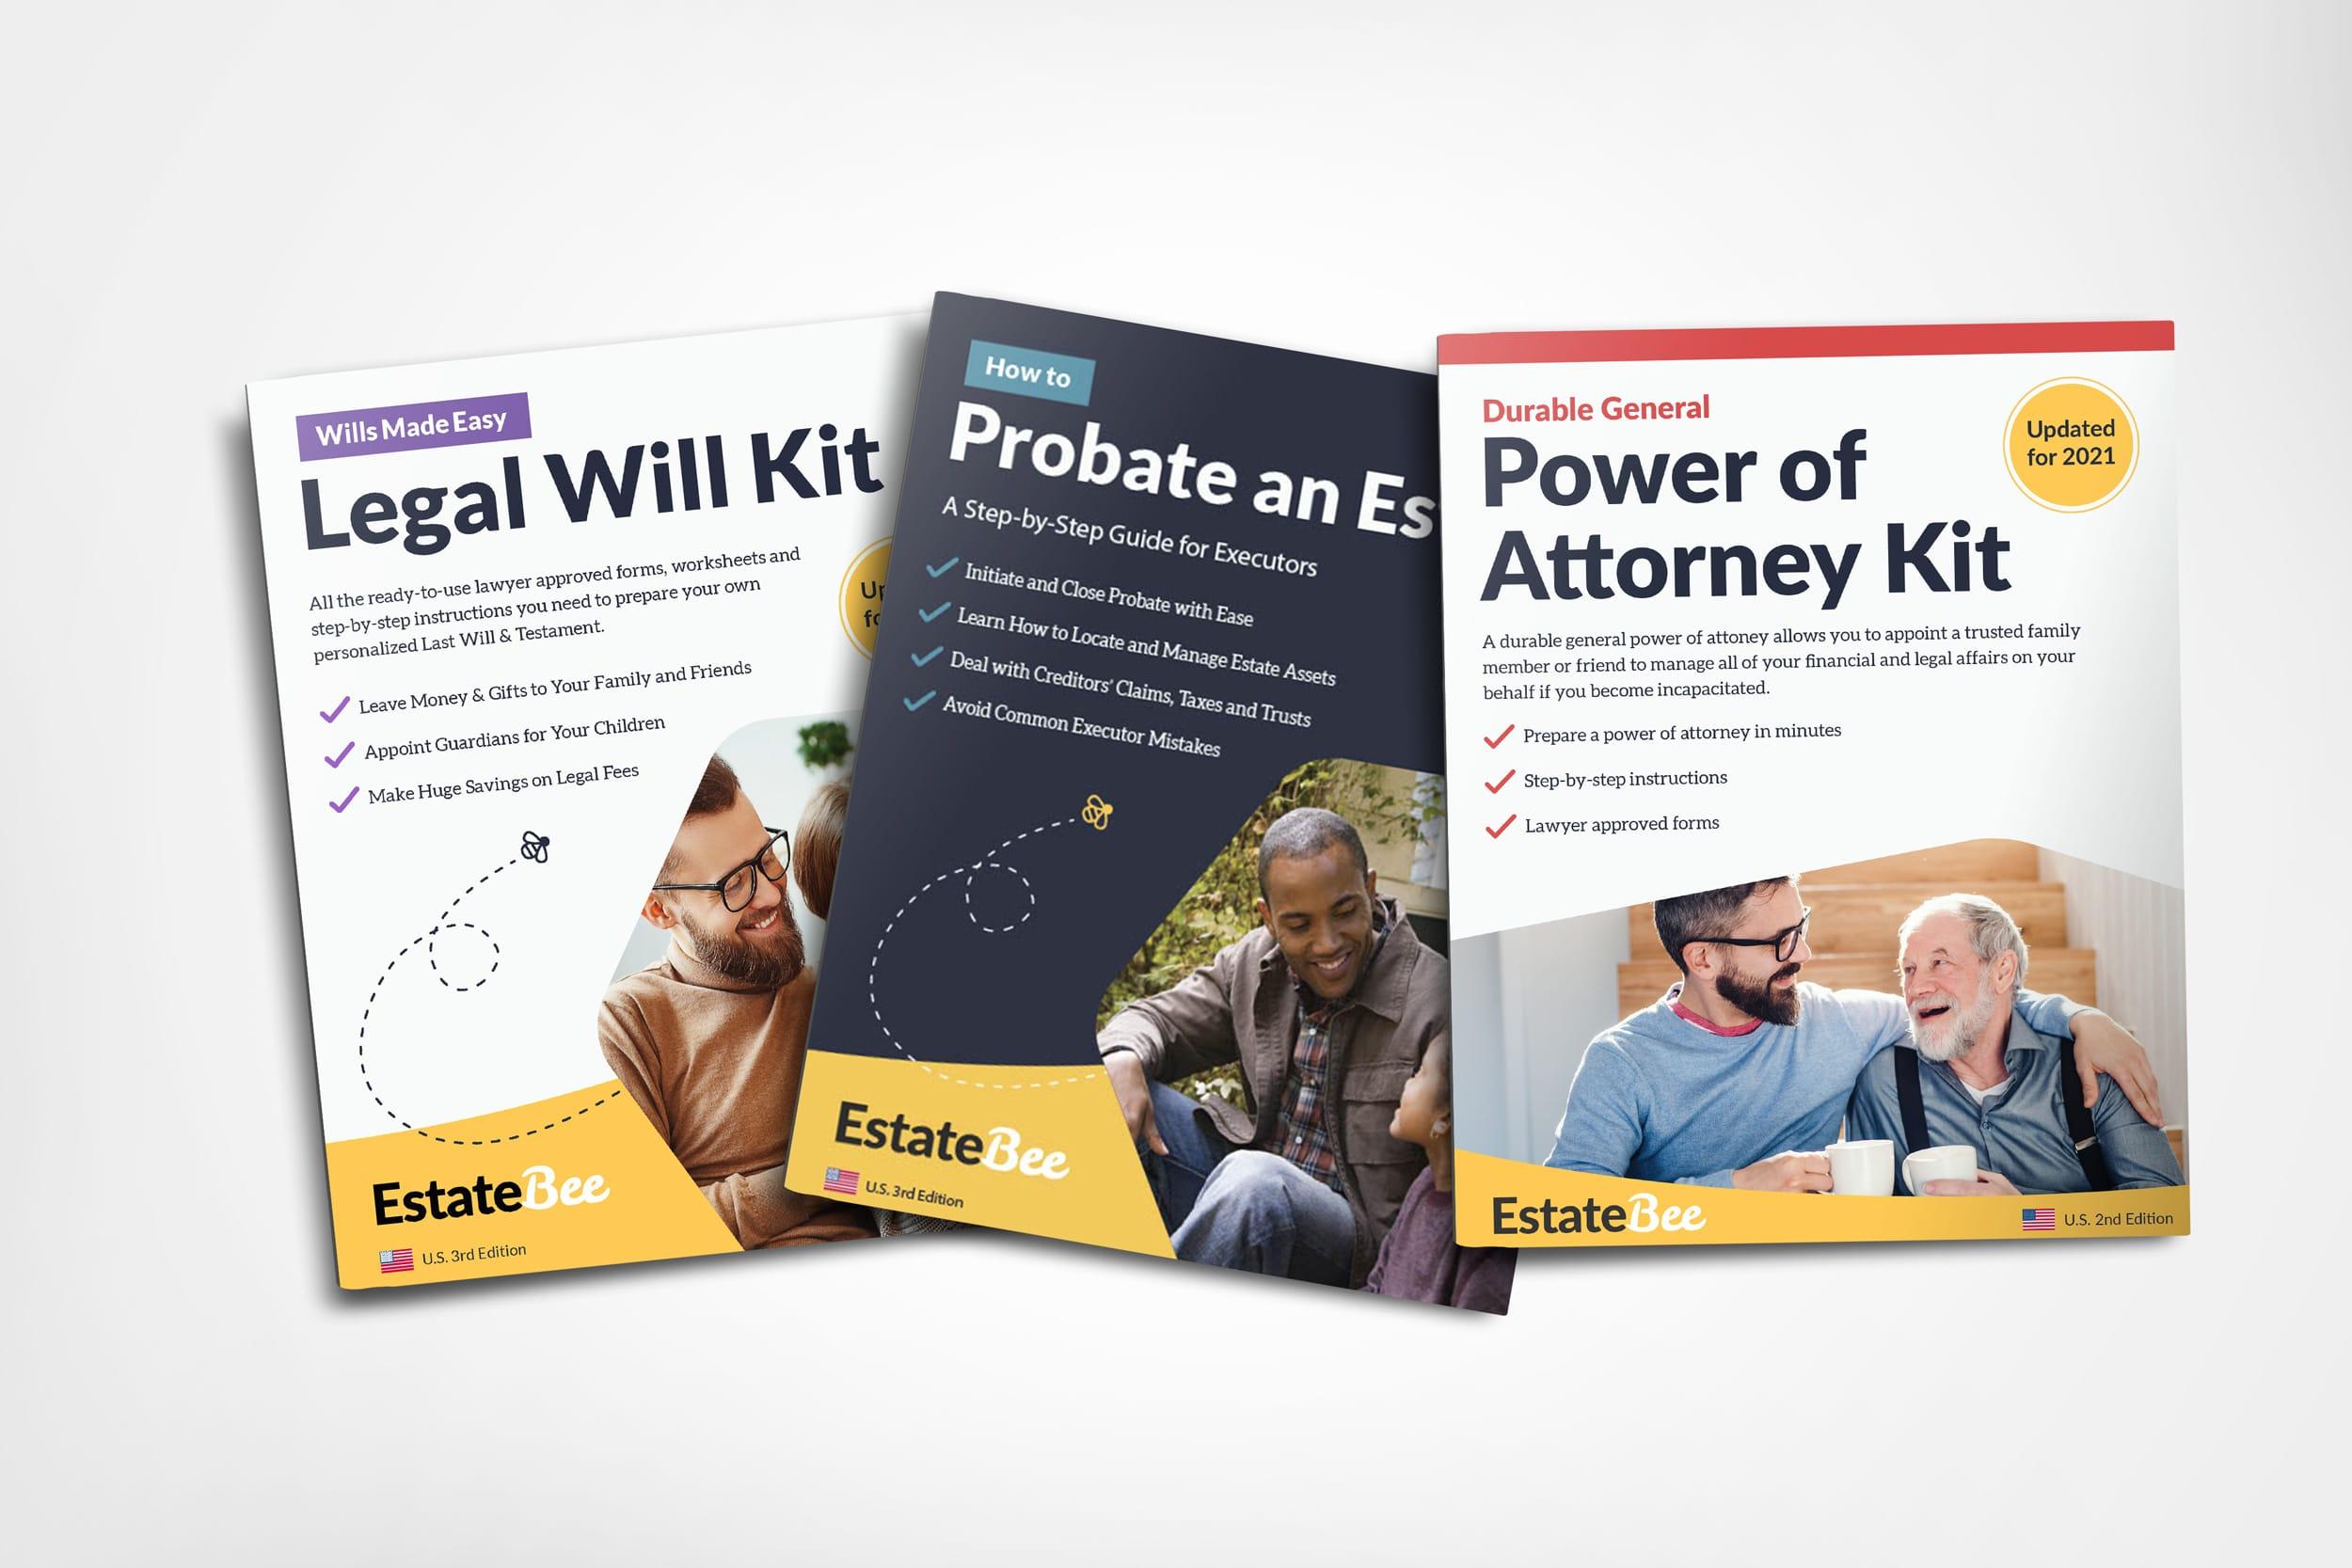 EstateBee book covers